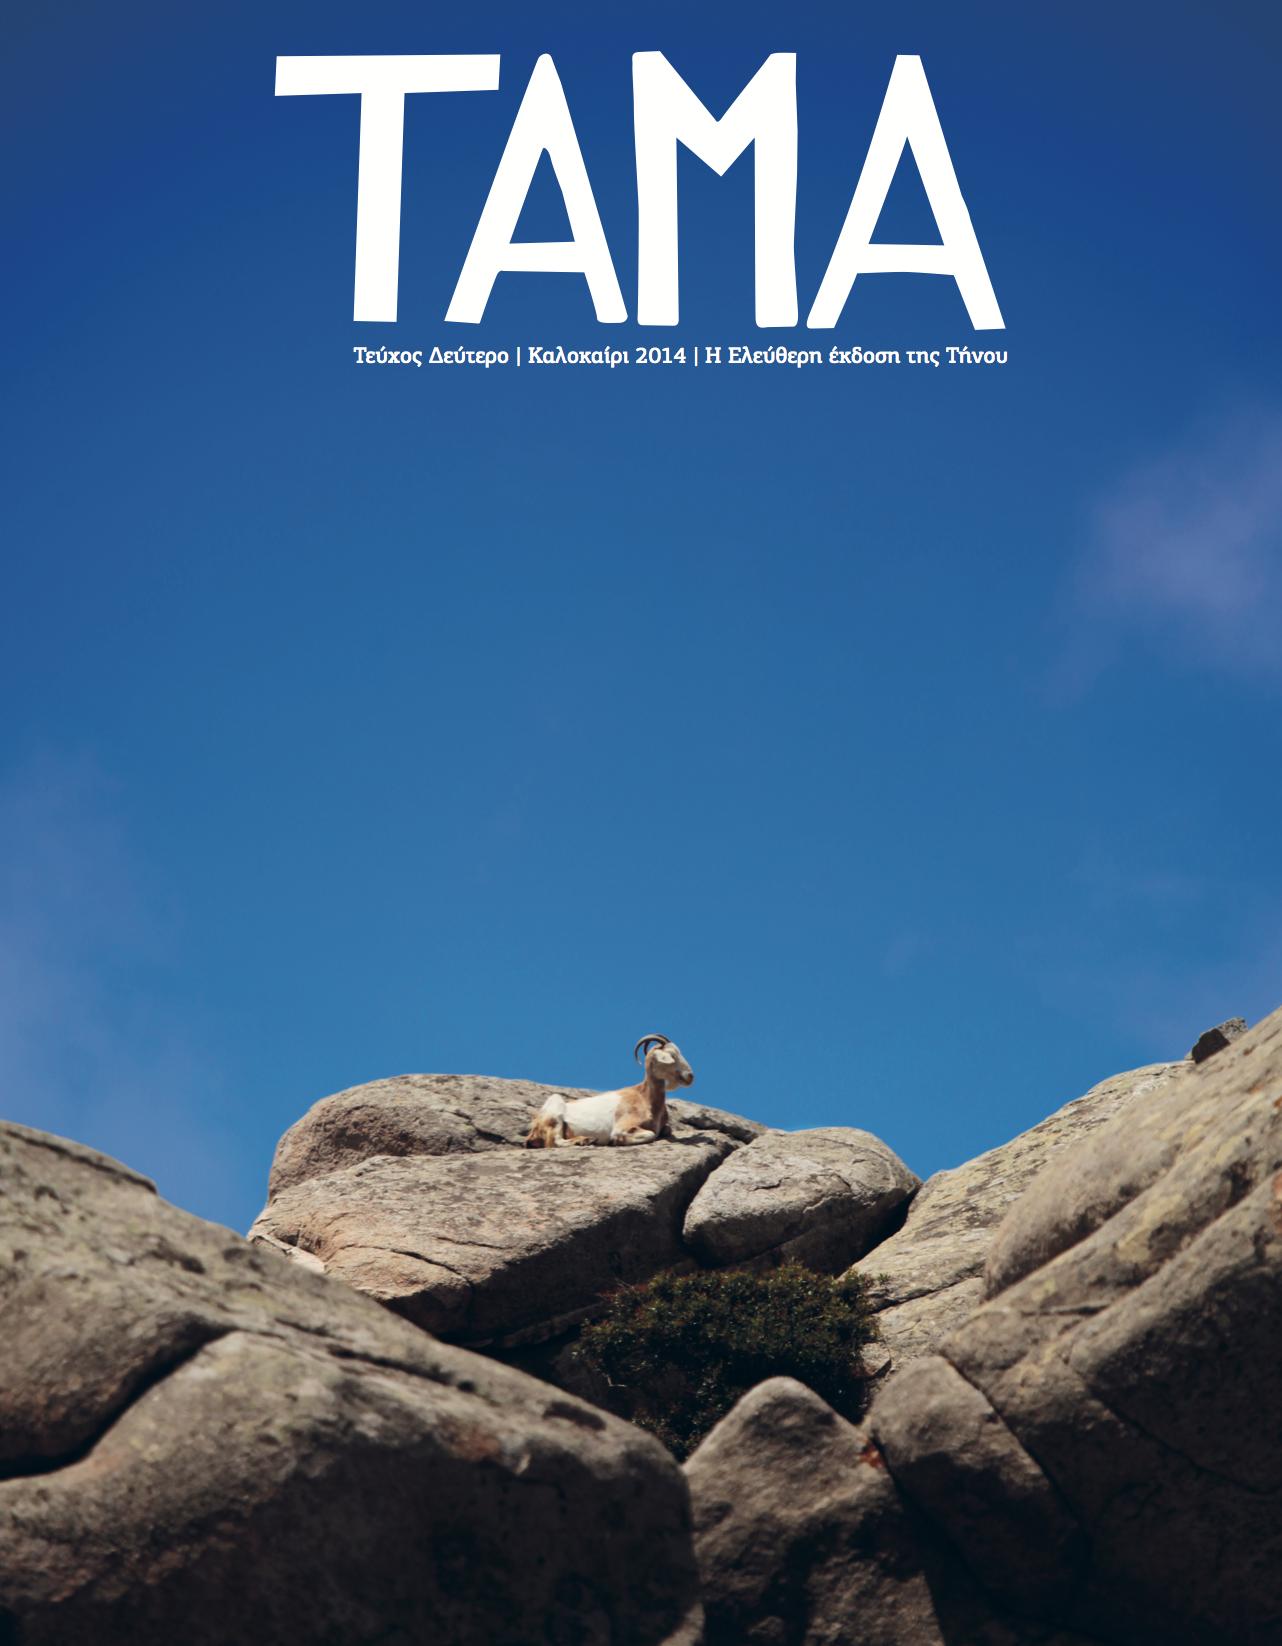 TAMA 2014